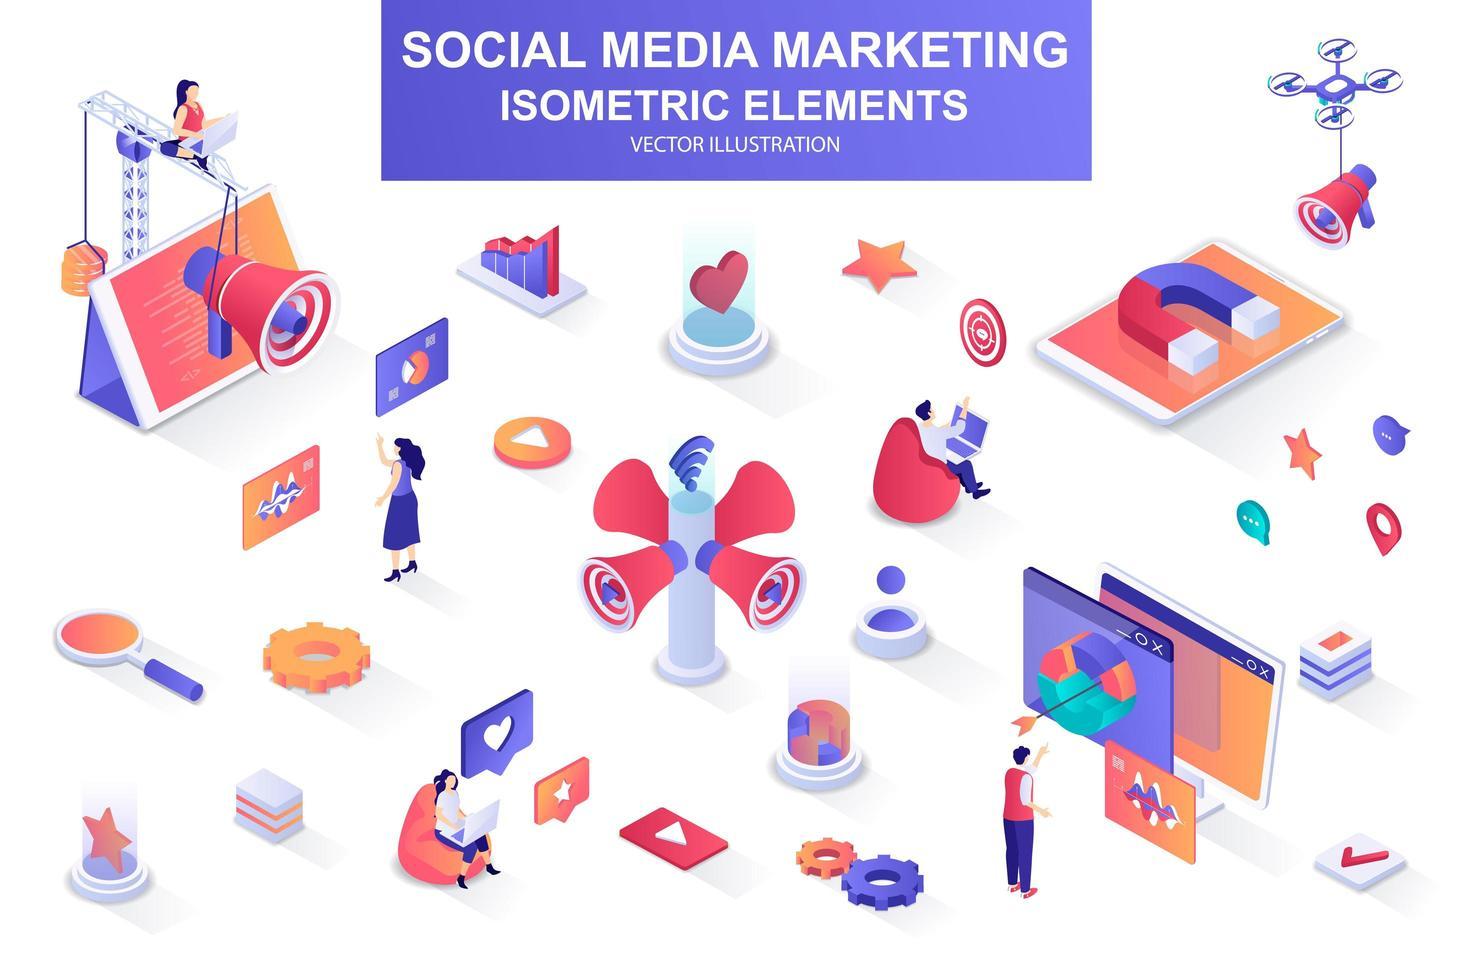 Social media marketing bundle of isometric elements. vector